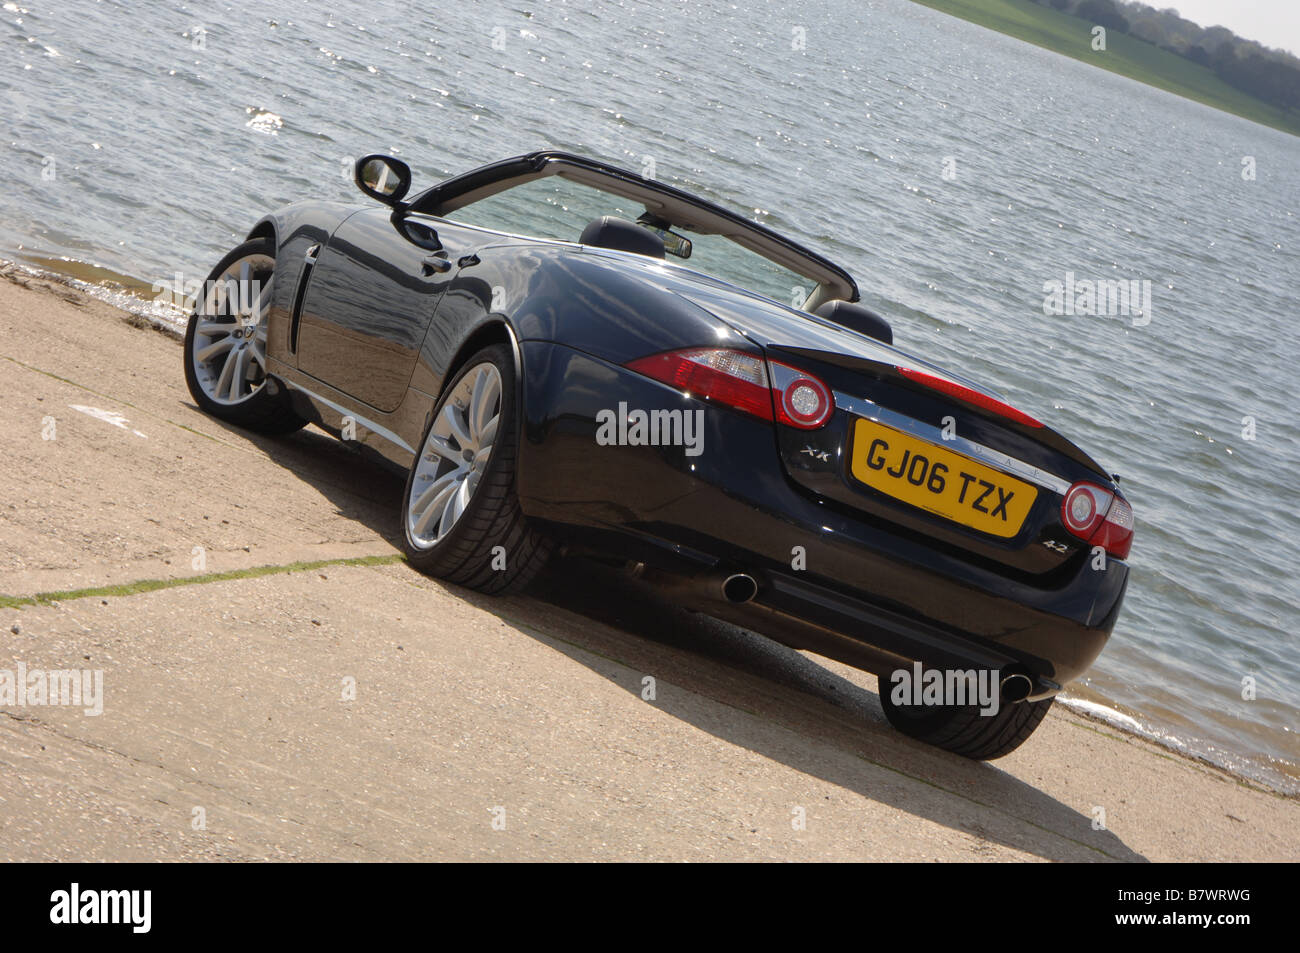 2006 Jaguar XK luxury sports car convertible - Stock Image